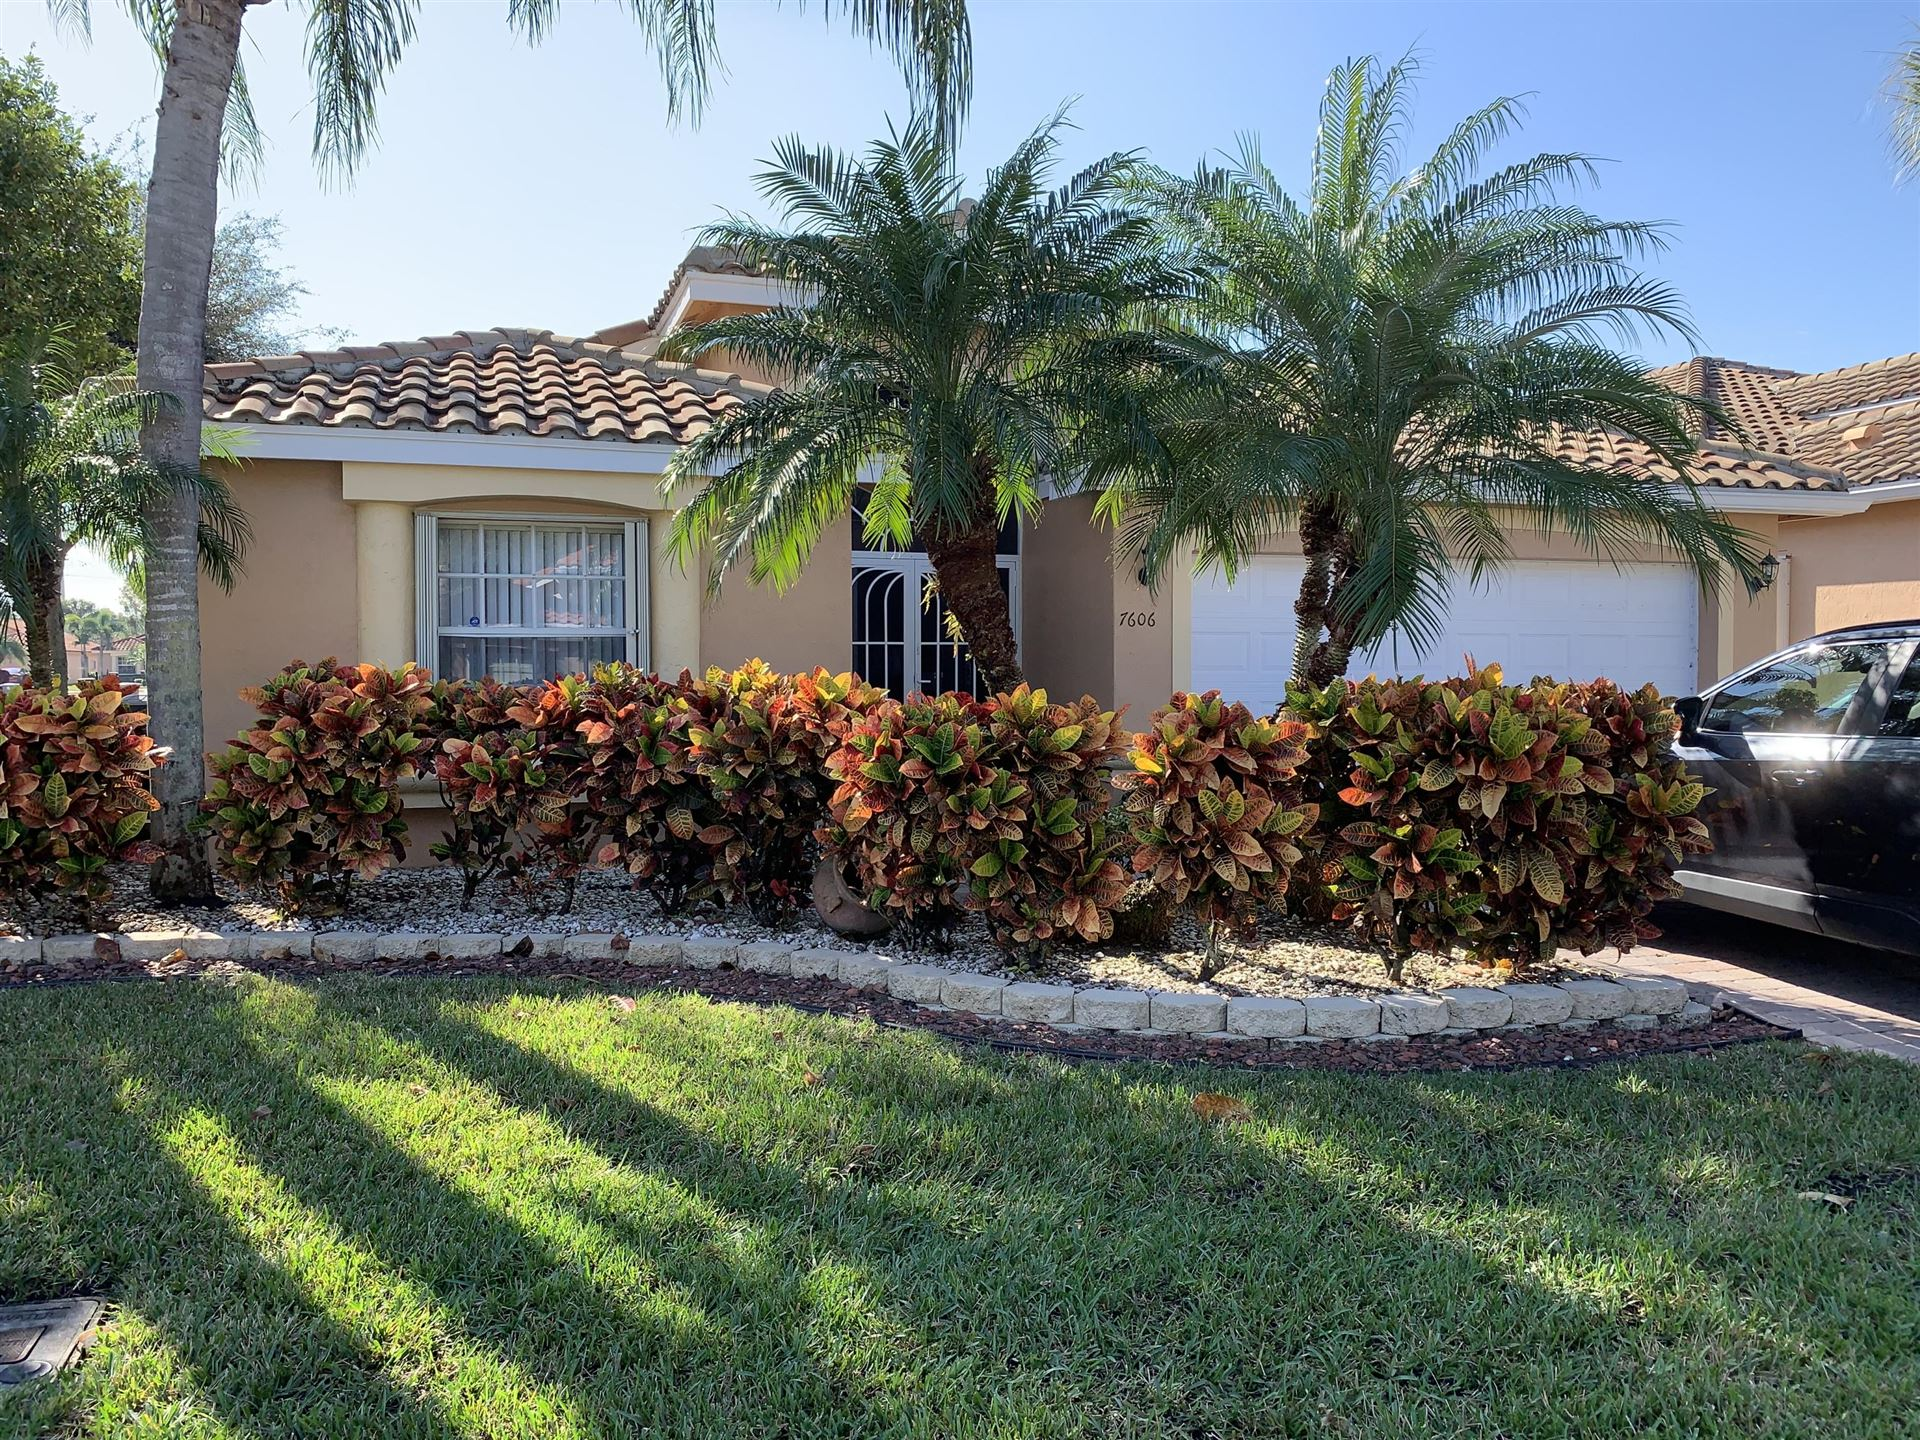 7606 Viniste Drive, Boynton Beach, FL 33472 - #: RX-10683951